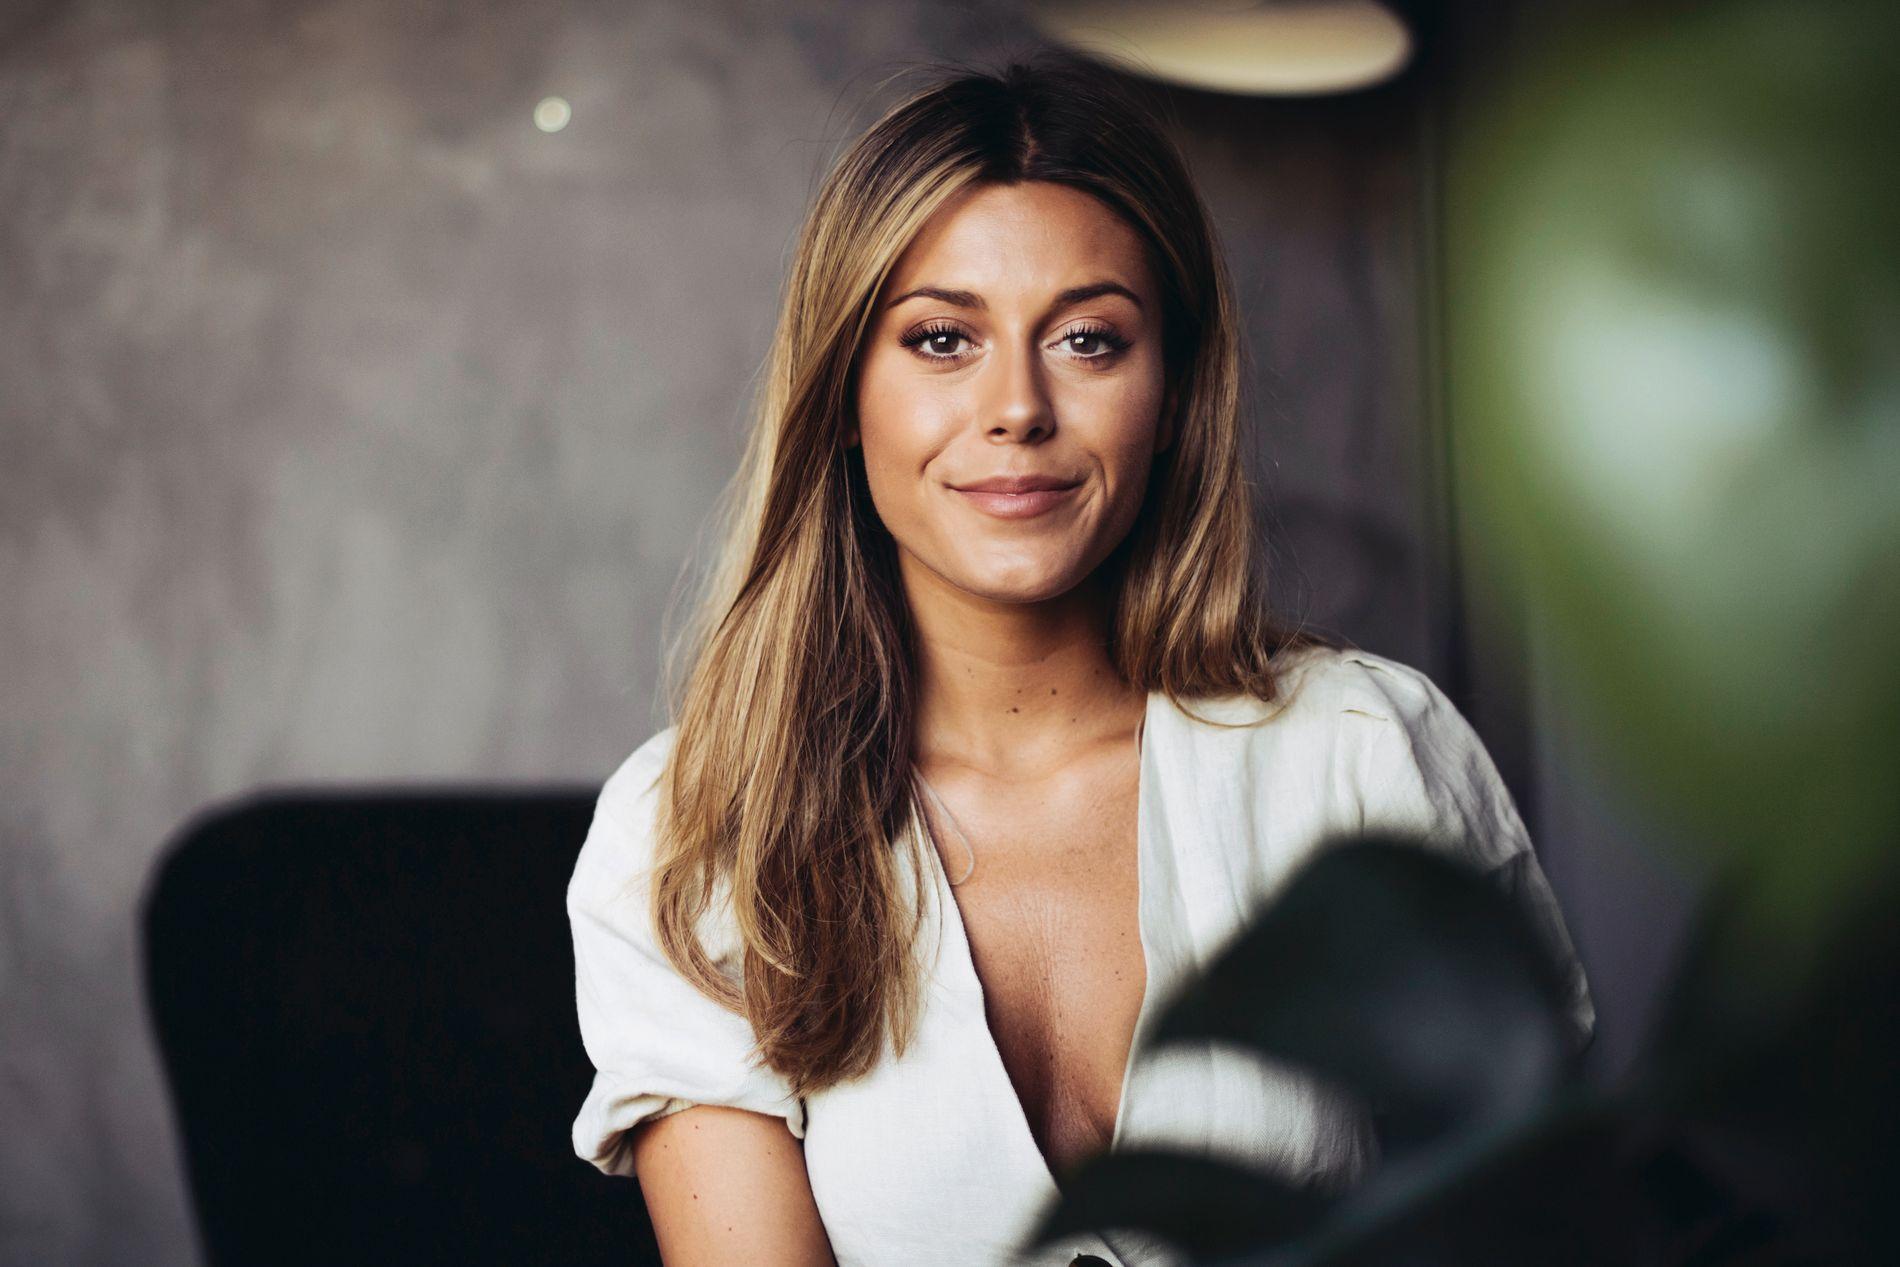 SVENSK INFLUENCER: Bianca Ingrosso (23) har flere hundretusener følgere i sosiale medier.